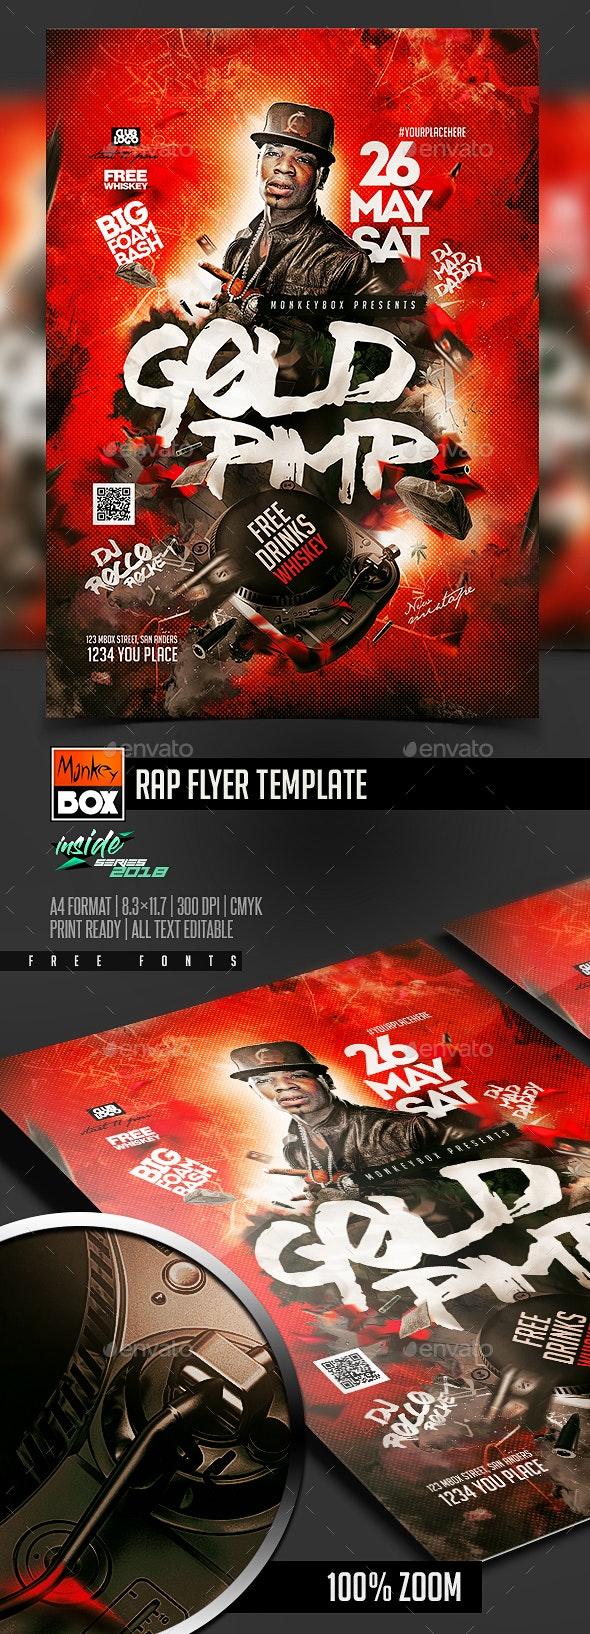 Rap Flyer Template - Clubs & Parties Events